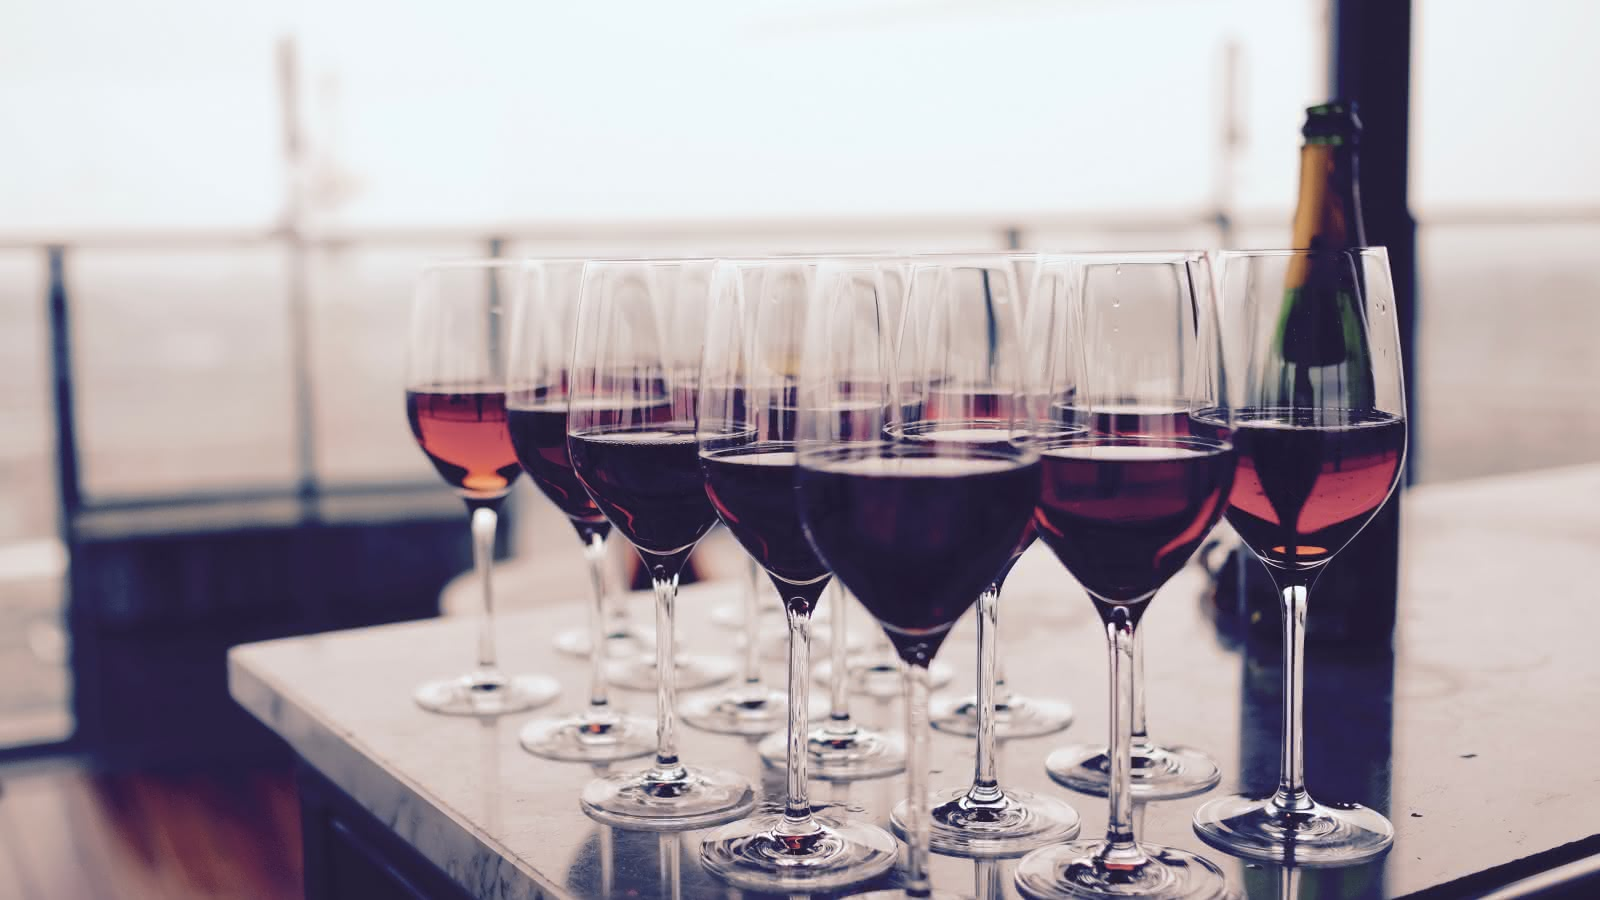 porto wine tasting tour